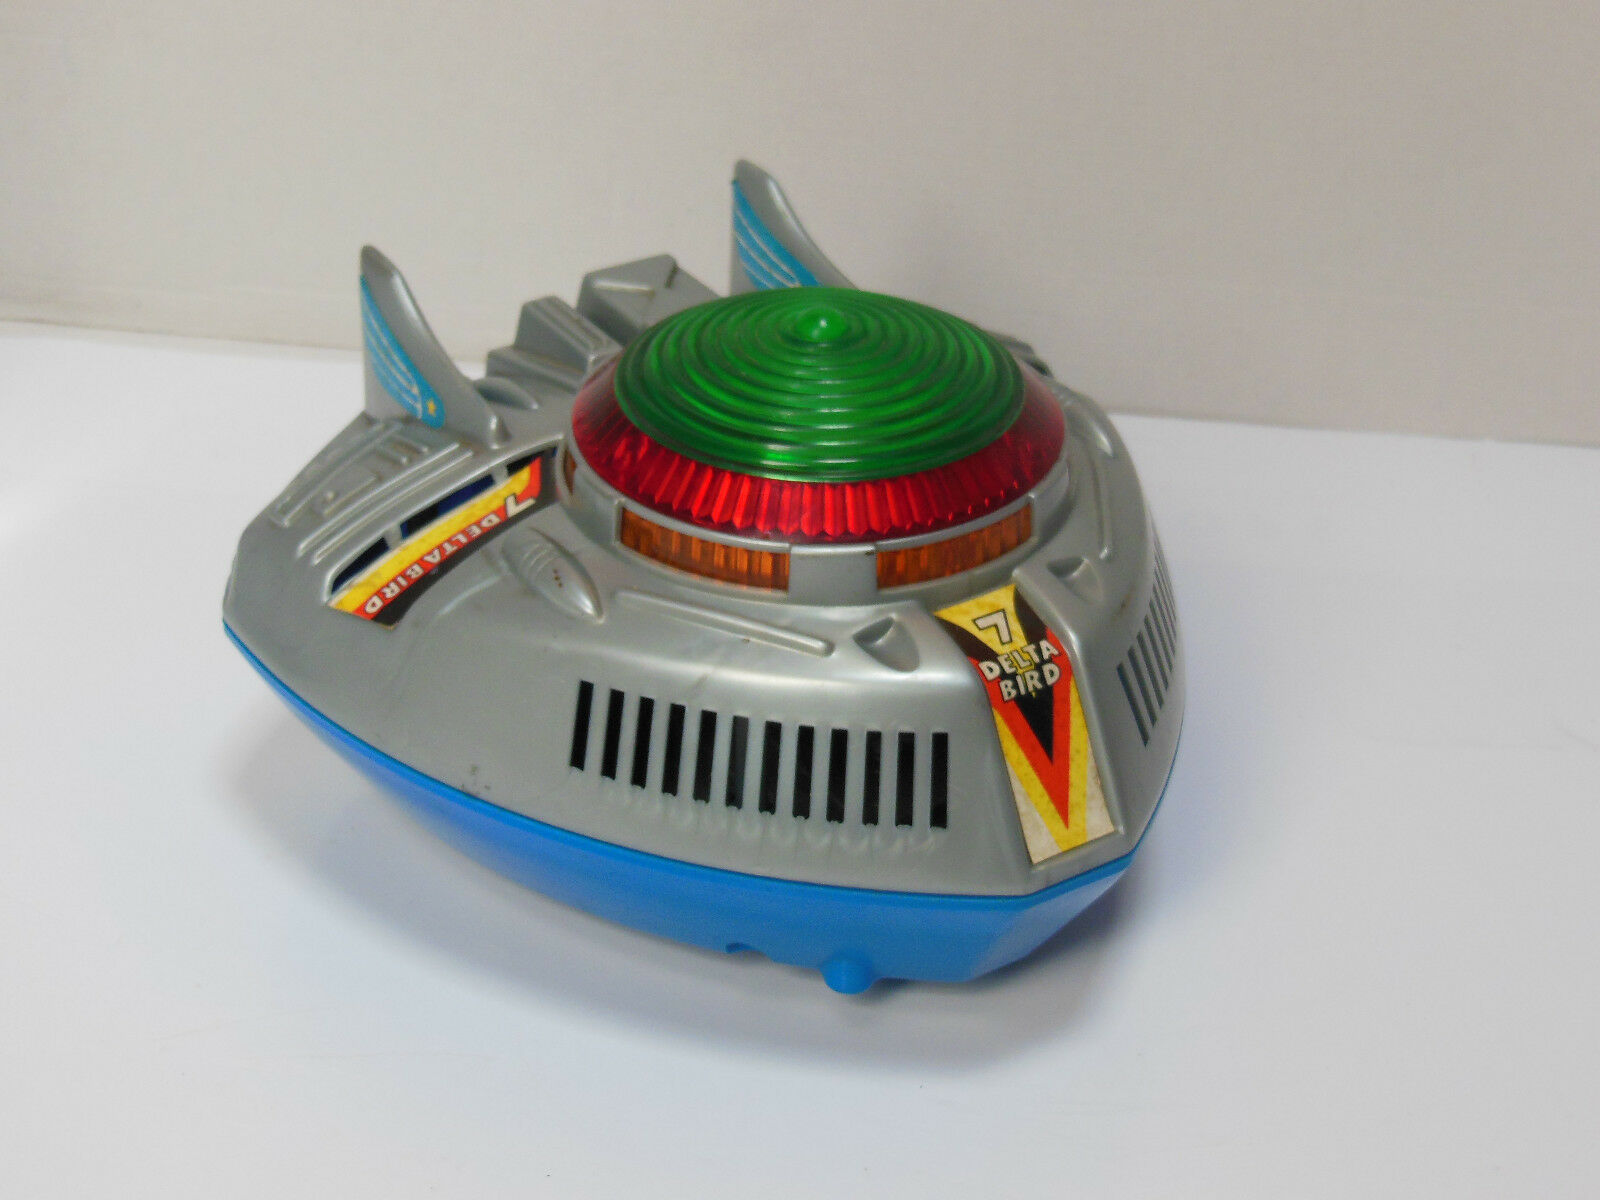 Nomura Delta Bird 7 Space Ship Toy Made in Japan anni 60 Funzionante